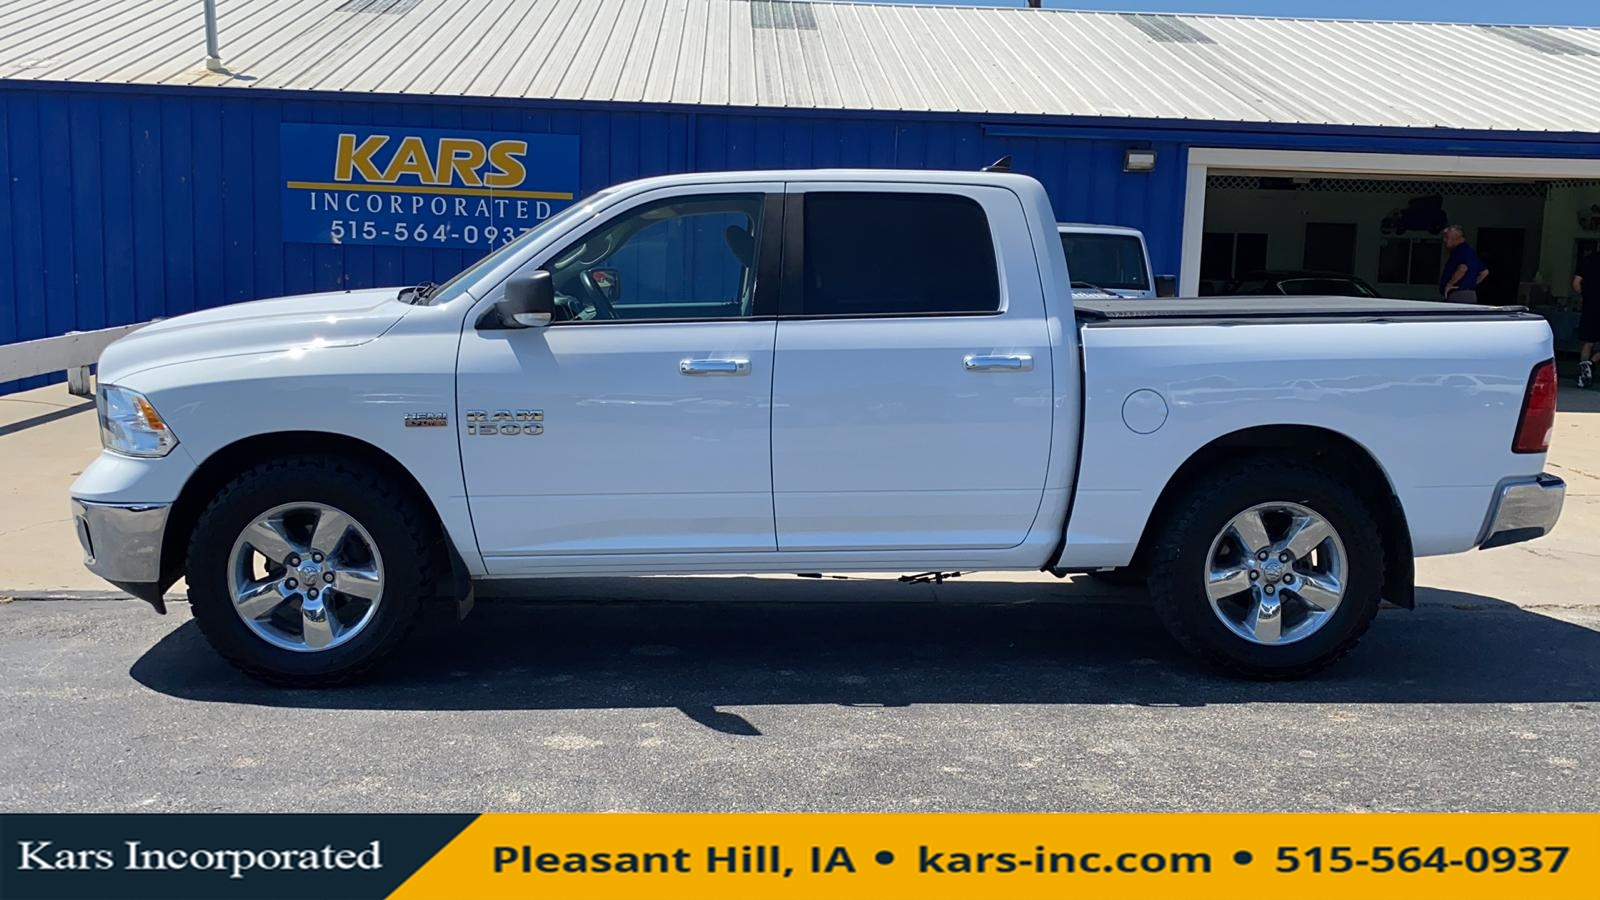 2013 Ram 1500 SLT 4WD Crew Cab  - D25706P  - Kars Incorporated